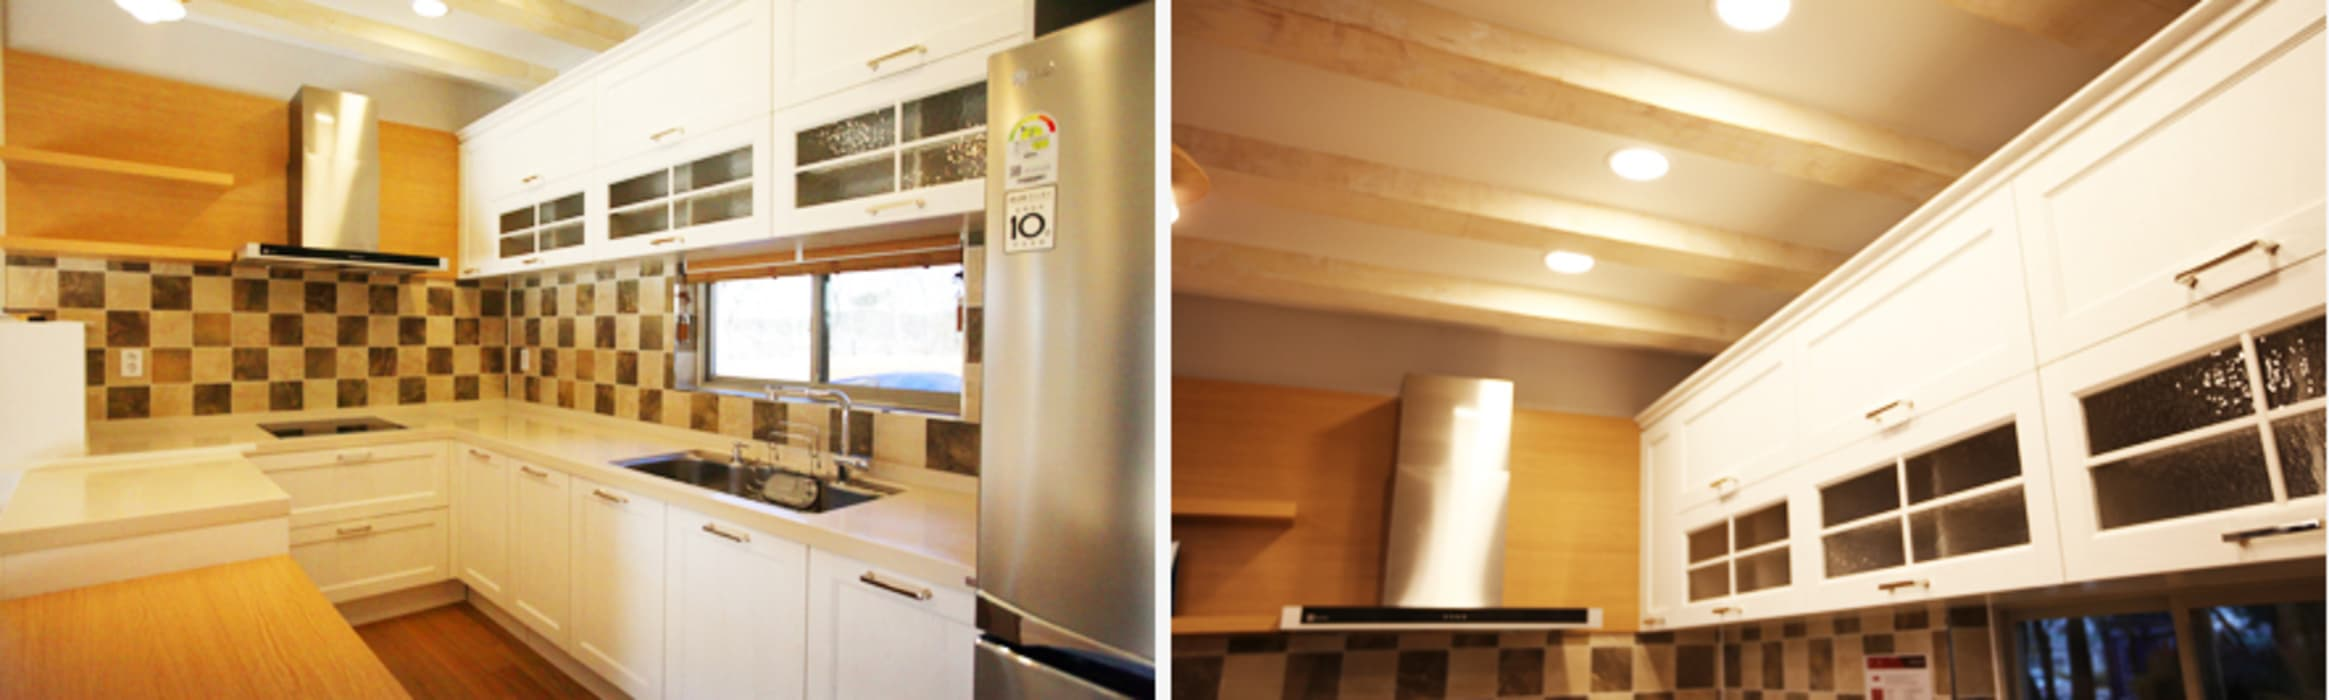 Kitchen by 지성하우징,